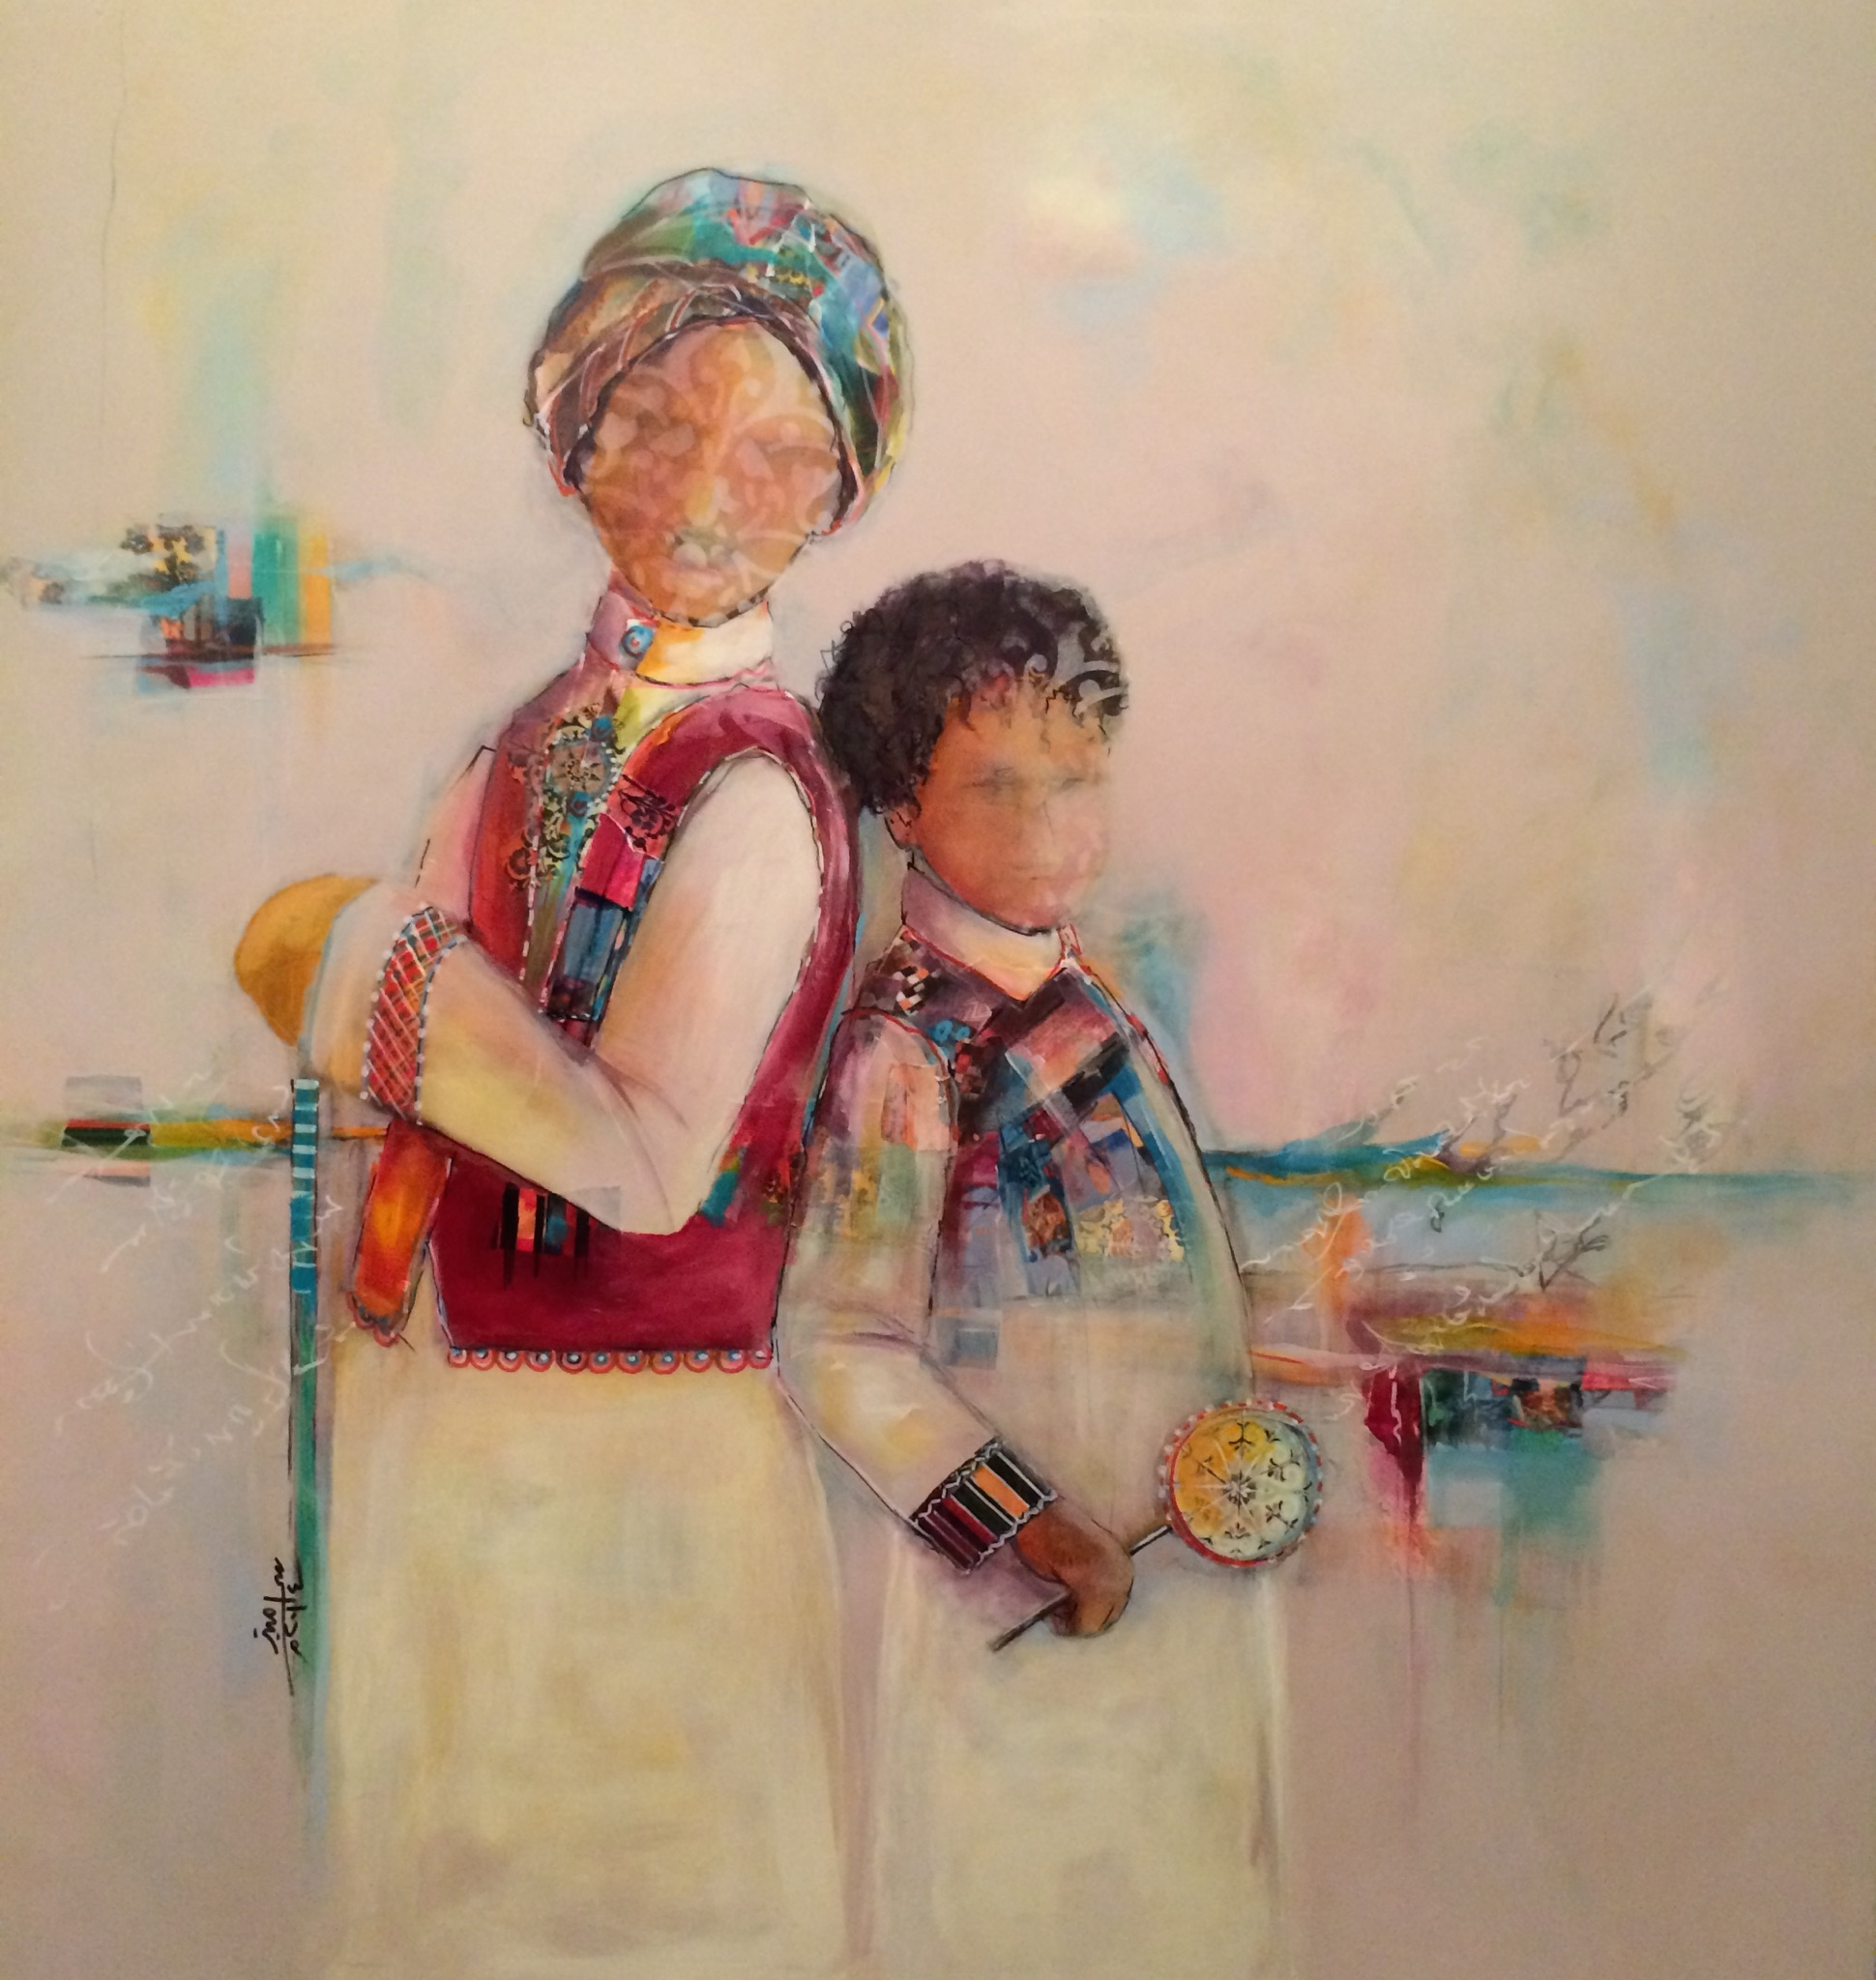 Al Awlad by Samiah Khashoggi